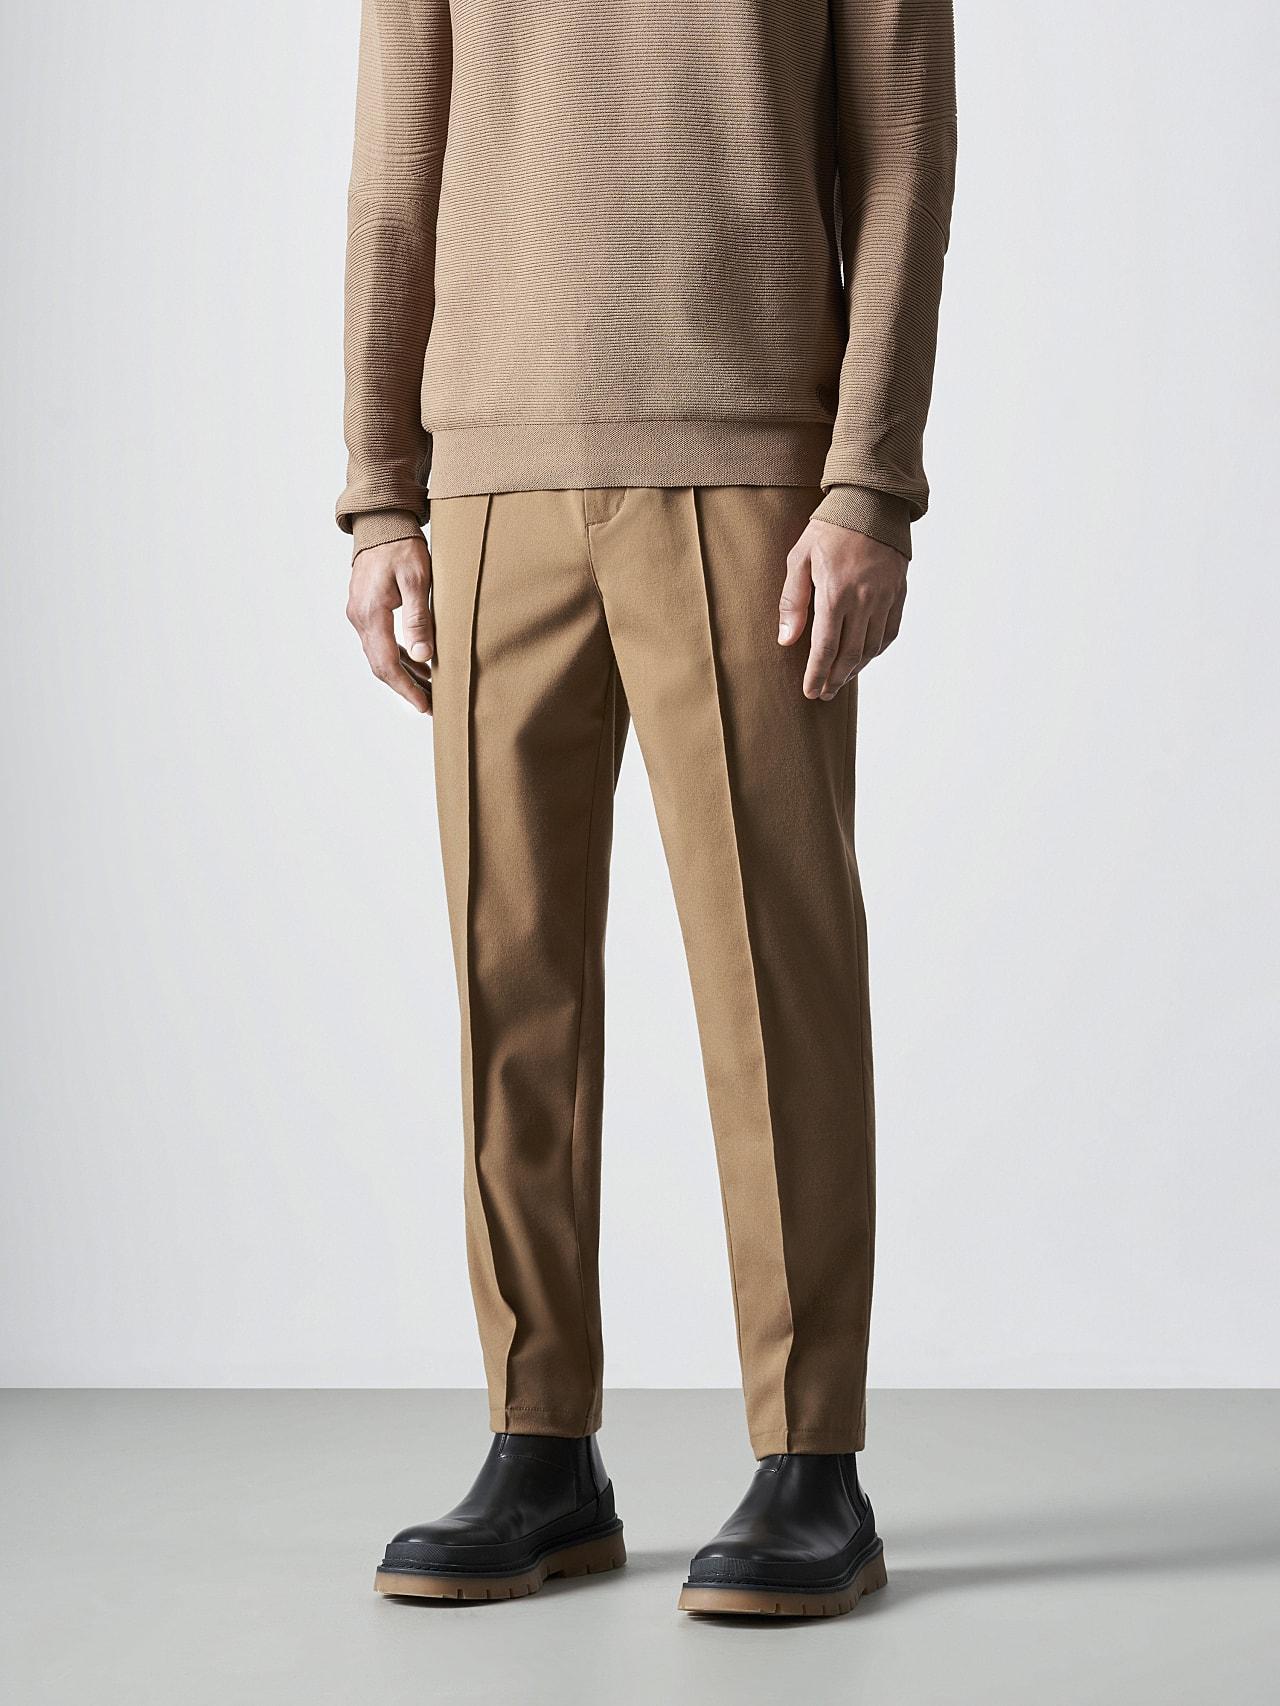 PANZA V1.Y5.02 Slim Pleat Trousers gold Model shot Alpha Tauri